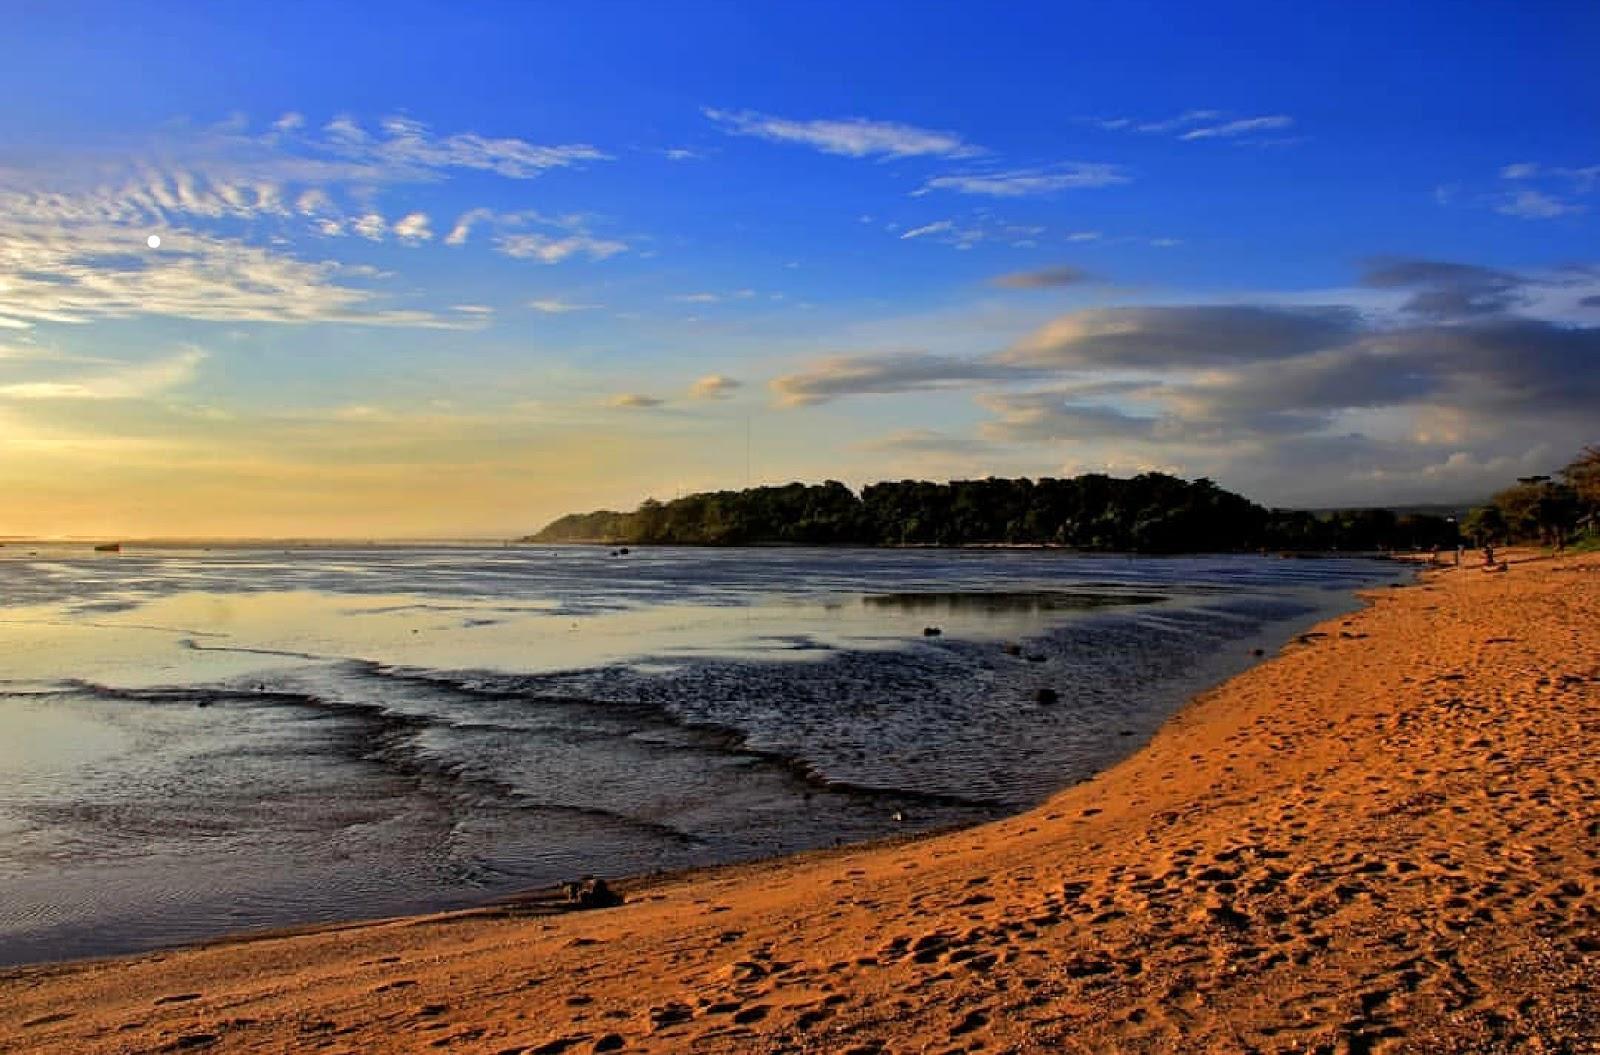 Sayang Heulang Beach